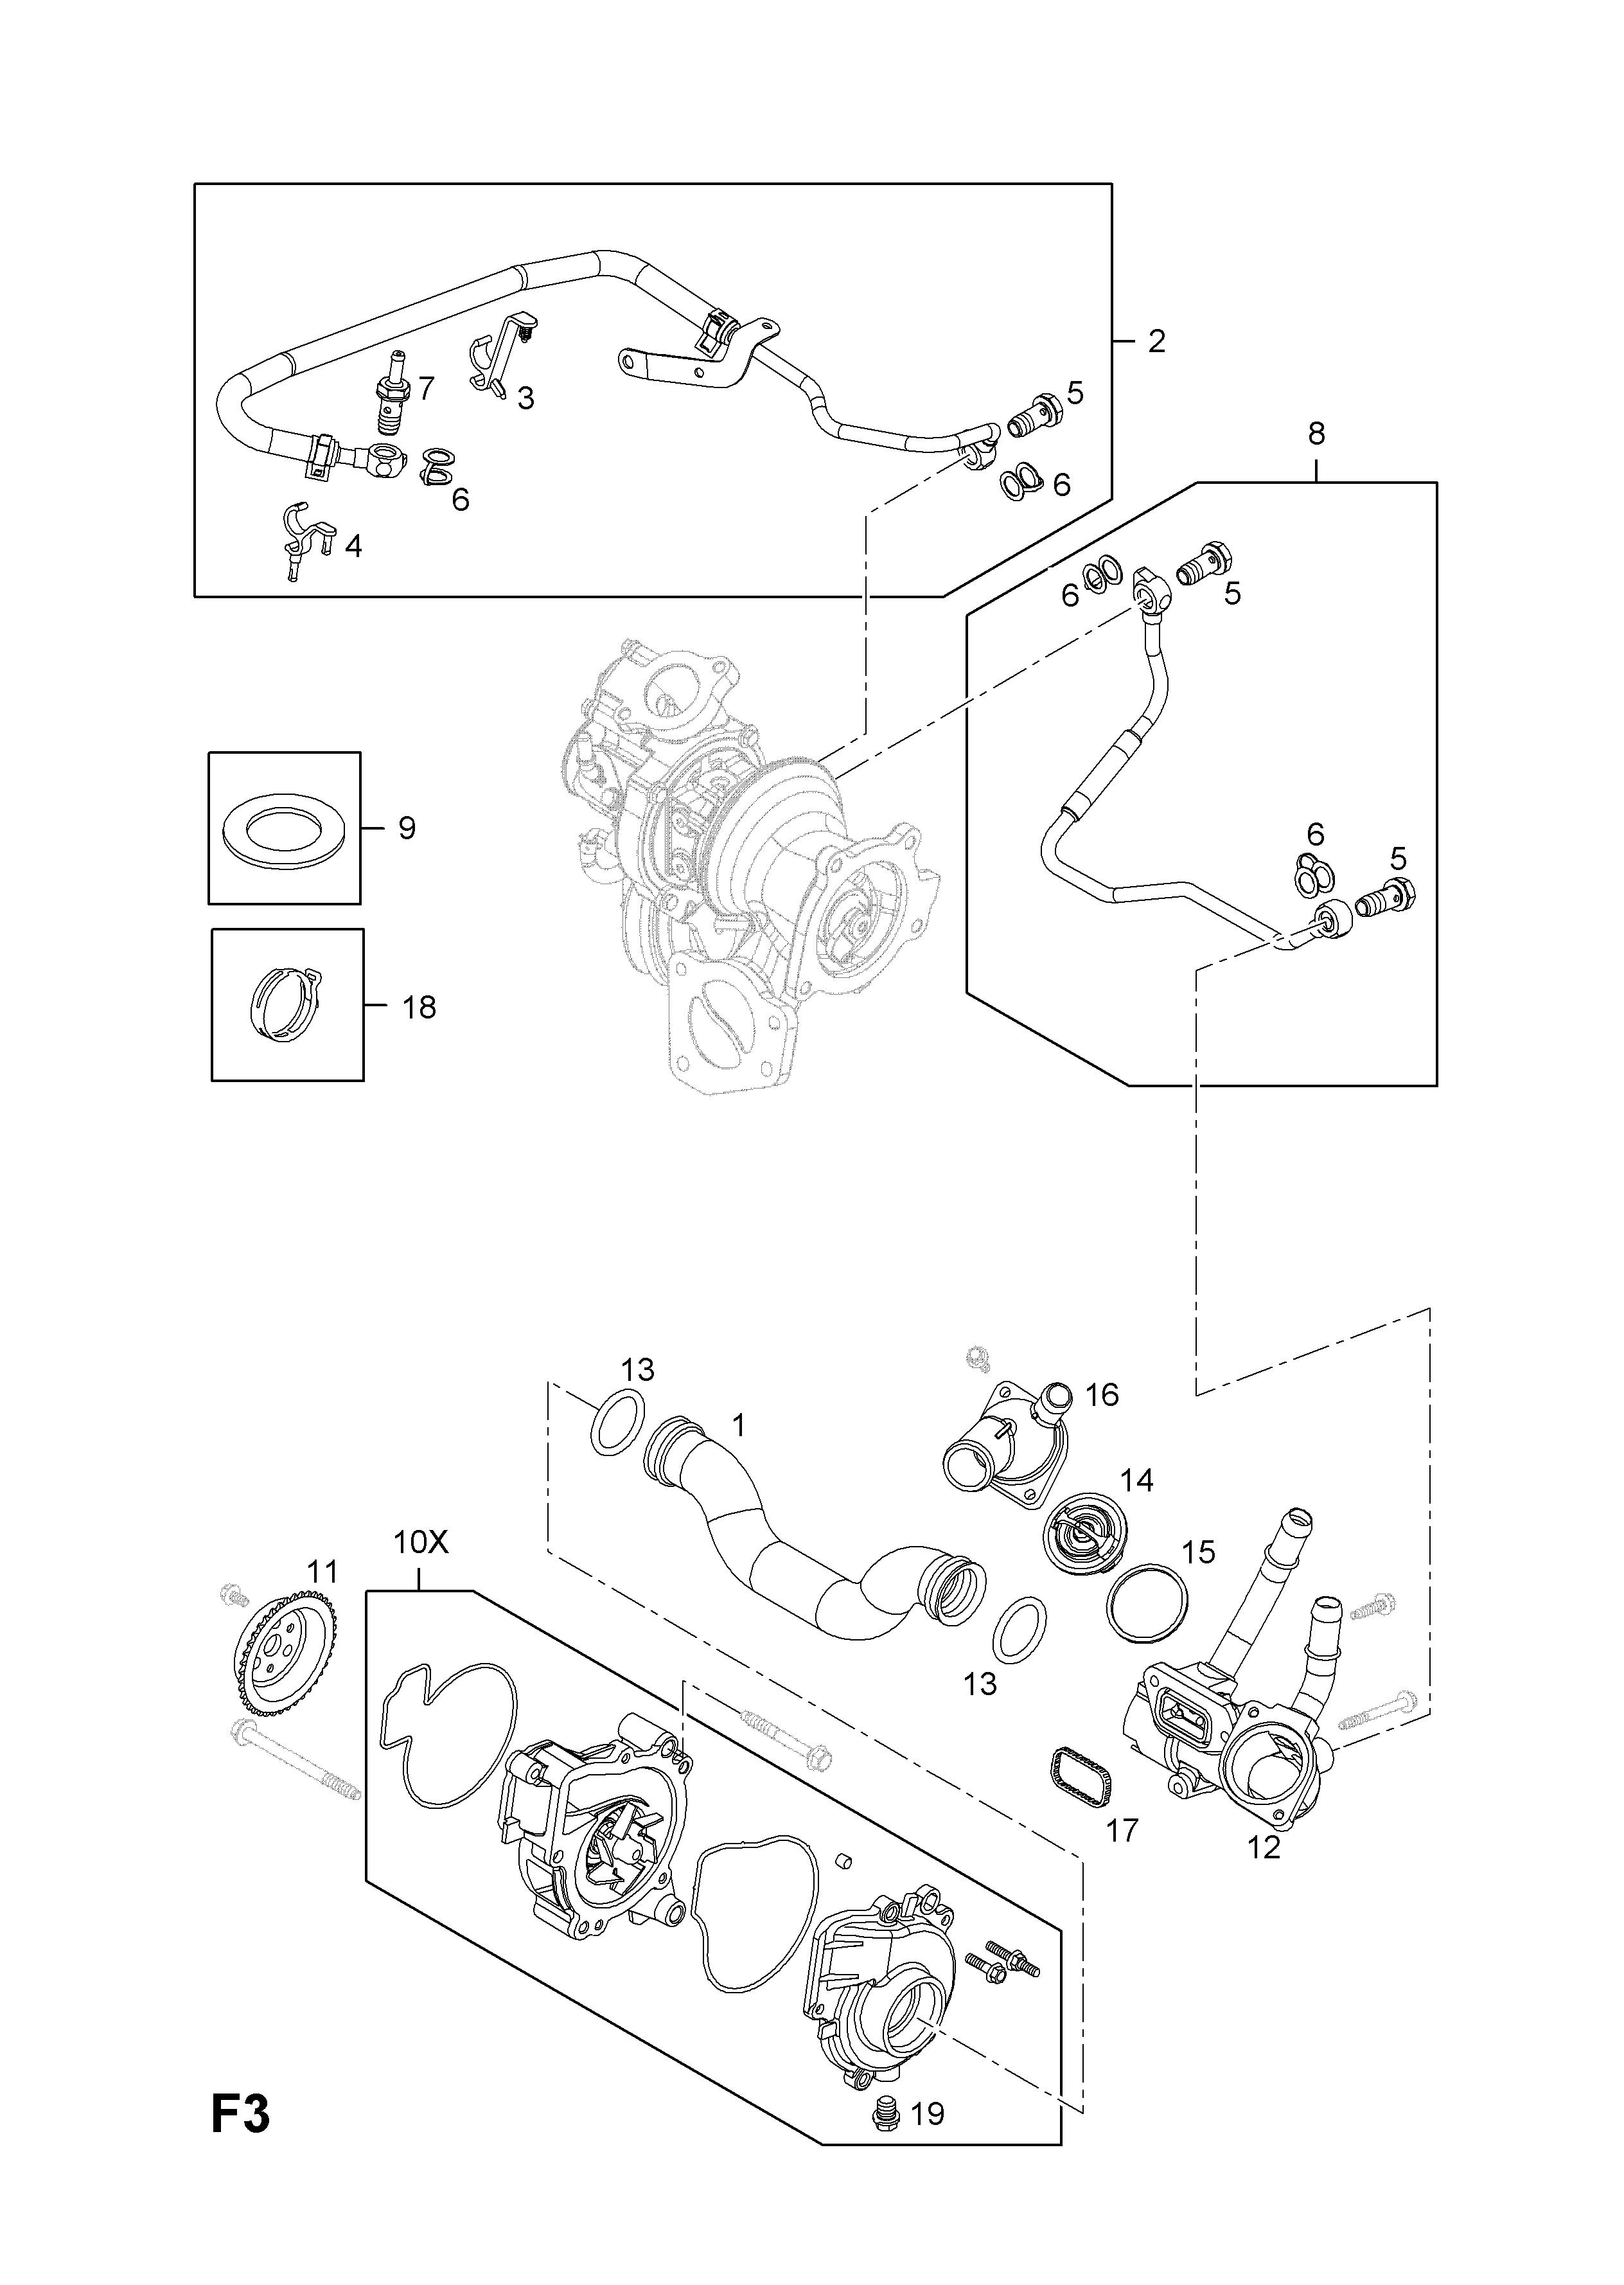 vauxhall zafira b wiring diagram online wiring diagram Opel Astra Interior vauxhall astra x reg fuse box wiring diagram databaseopel gt fuse box wiring diagram database vauxhall